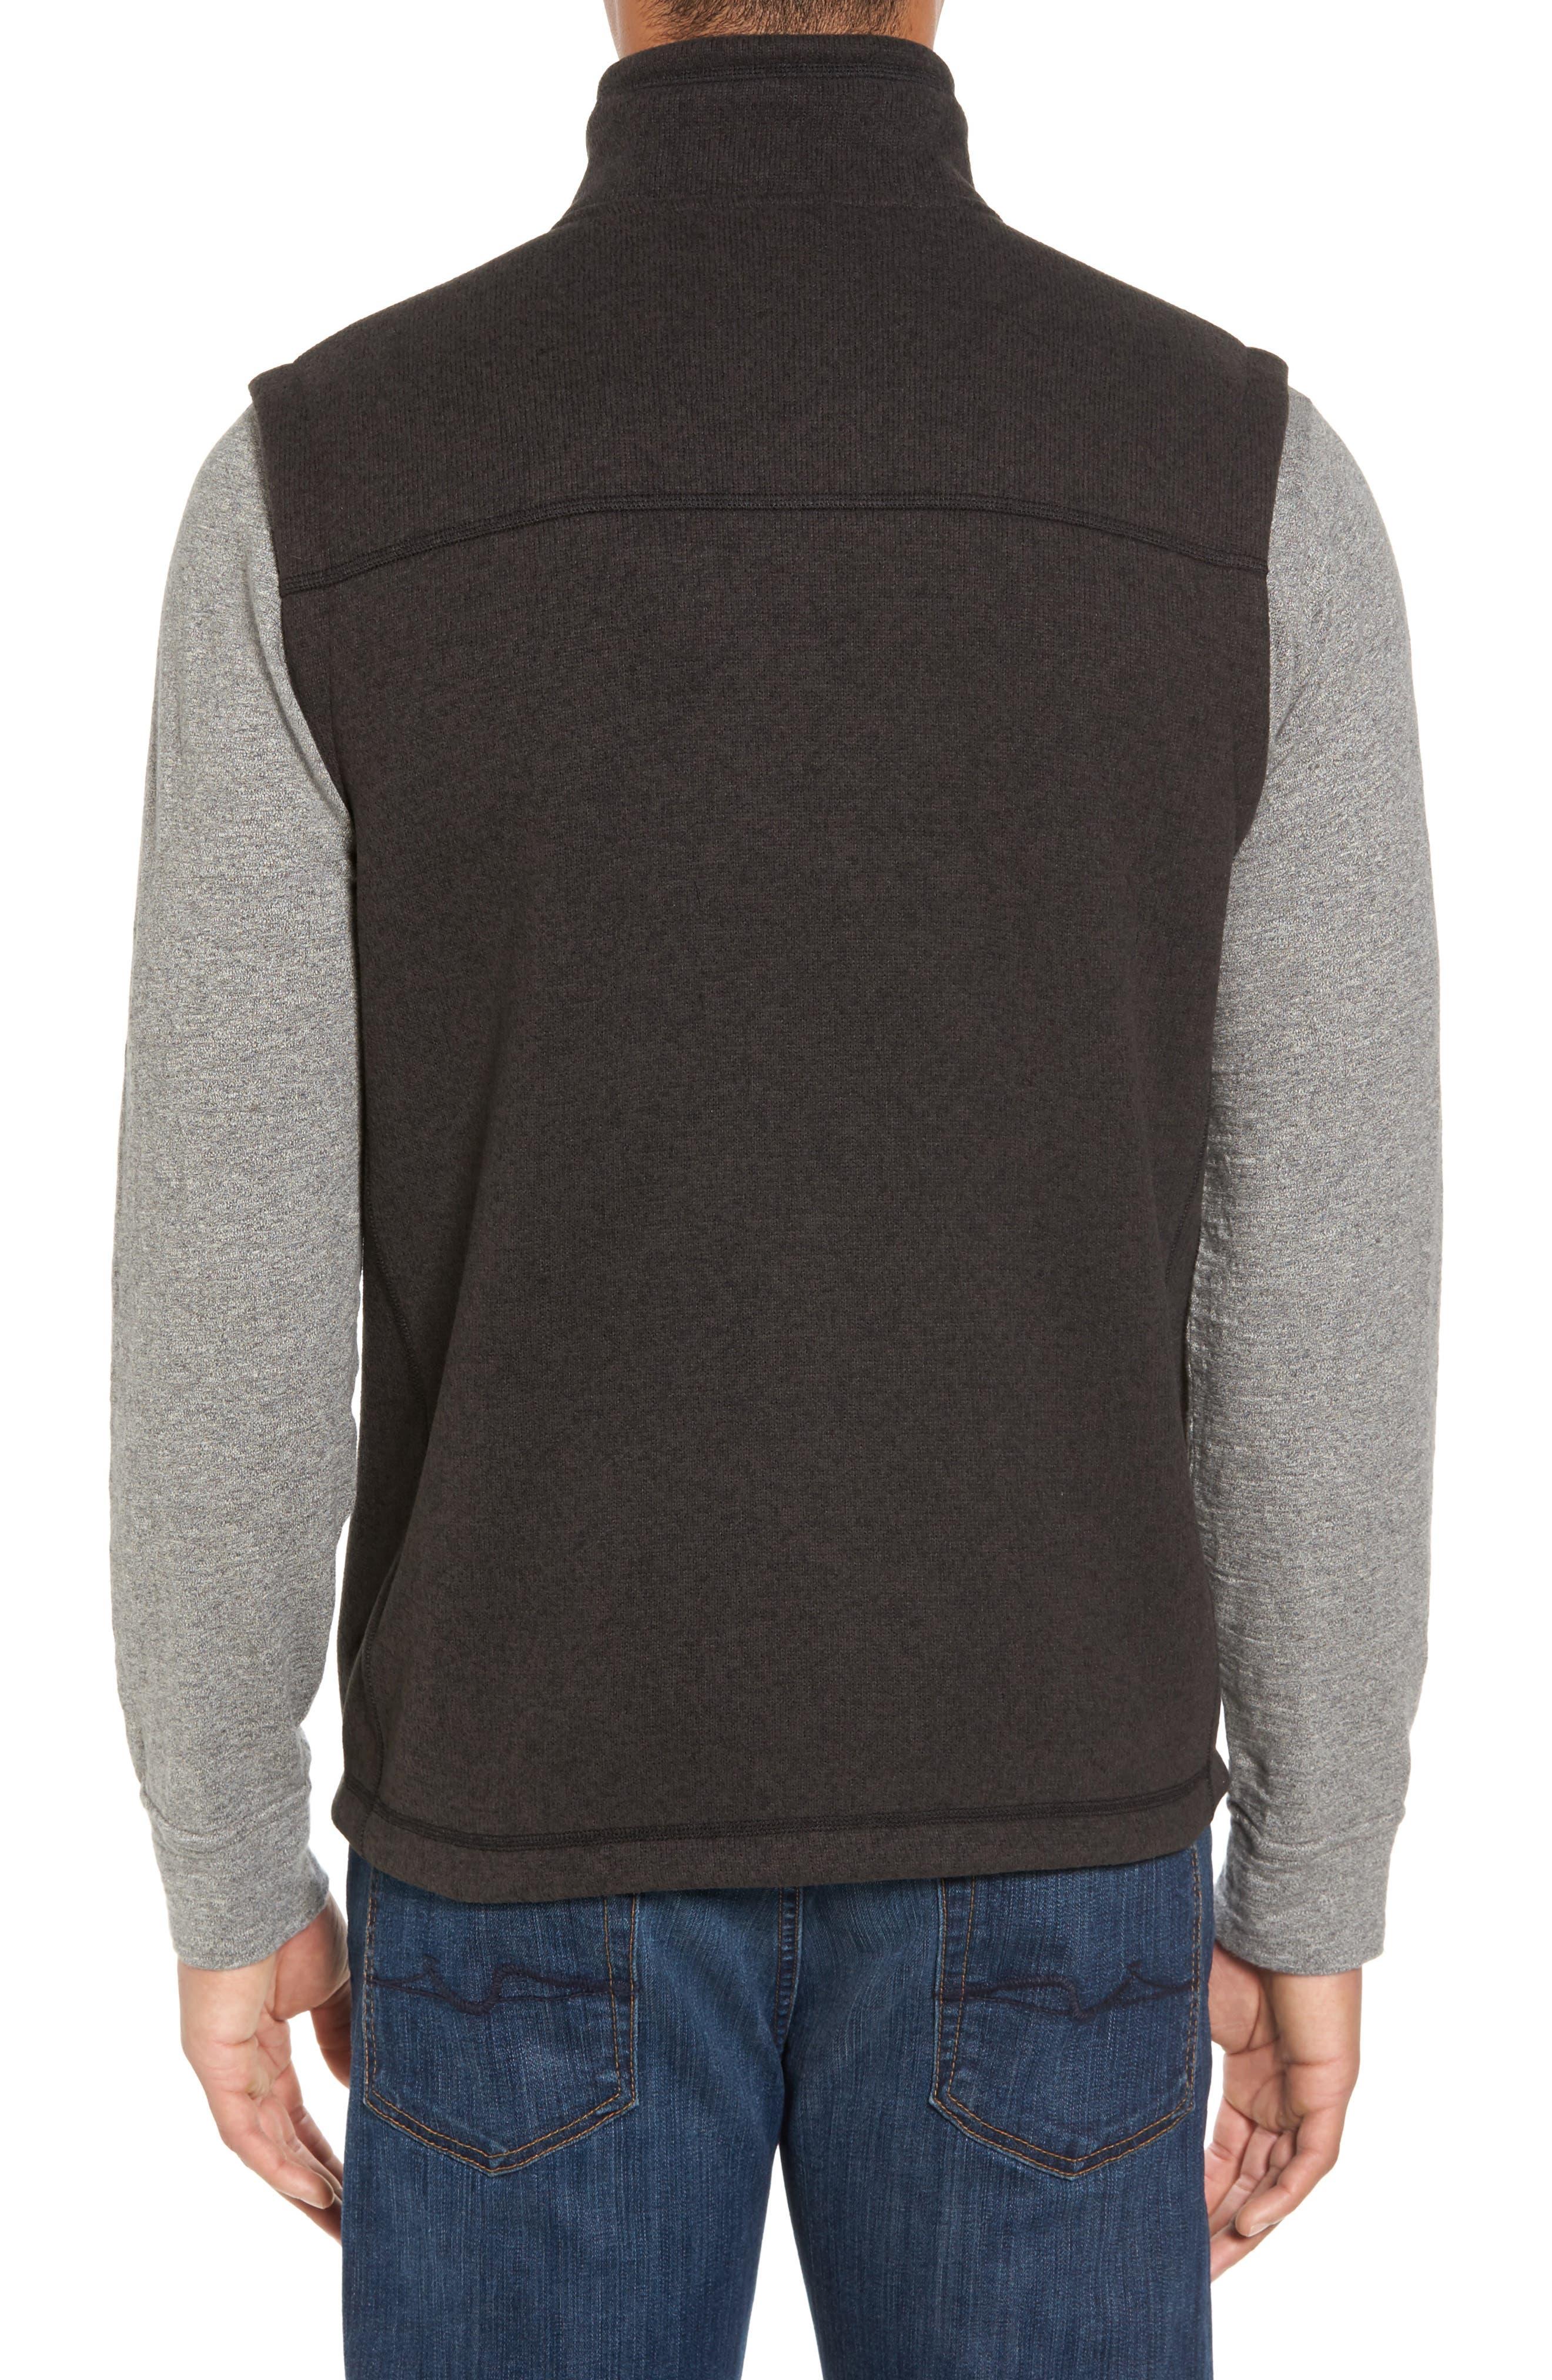 Gordon Lyons Zip Fleece Vest,                             Alternate thumbnail 6, color,